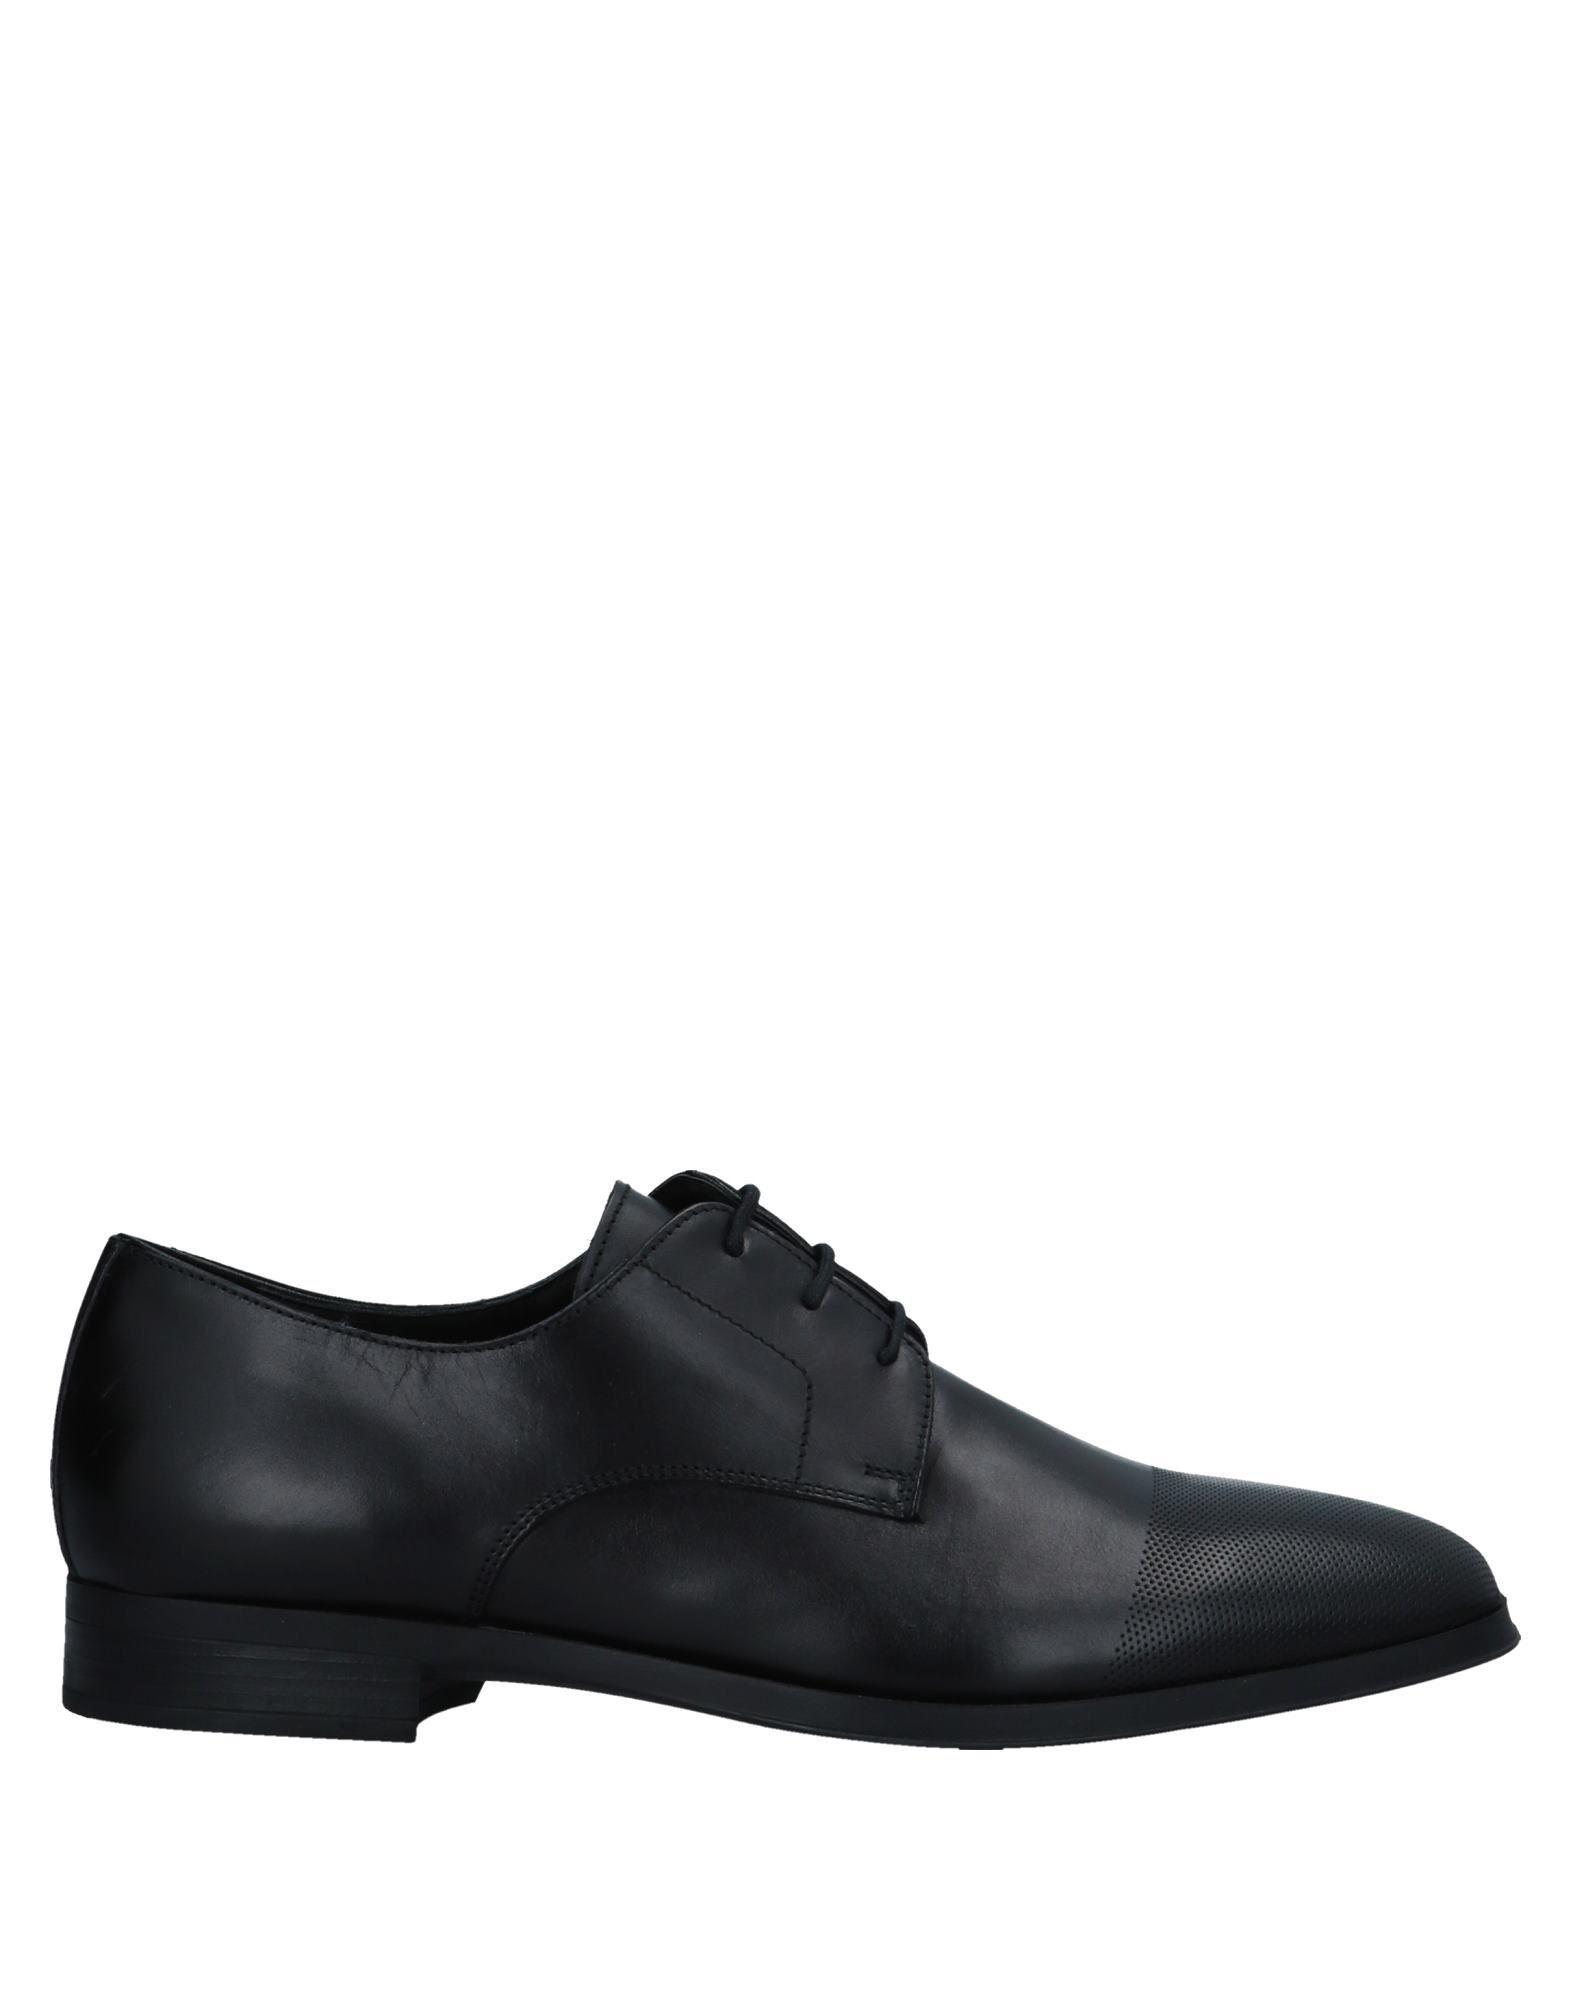 Rabatt echte Schuhe Geox  Schnürschuhe Herren  Geox 11216179XW 6d8c64